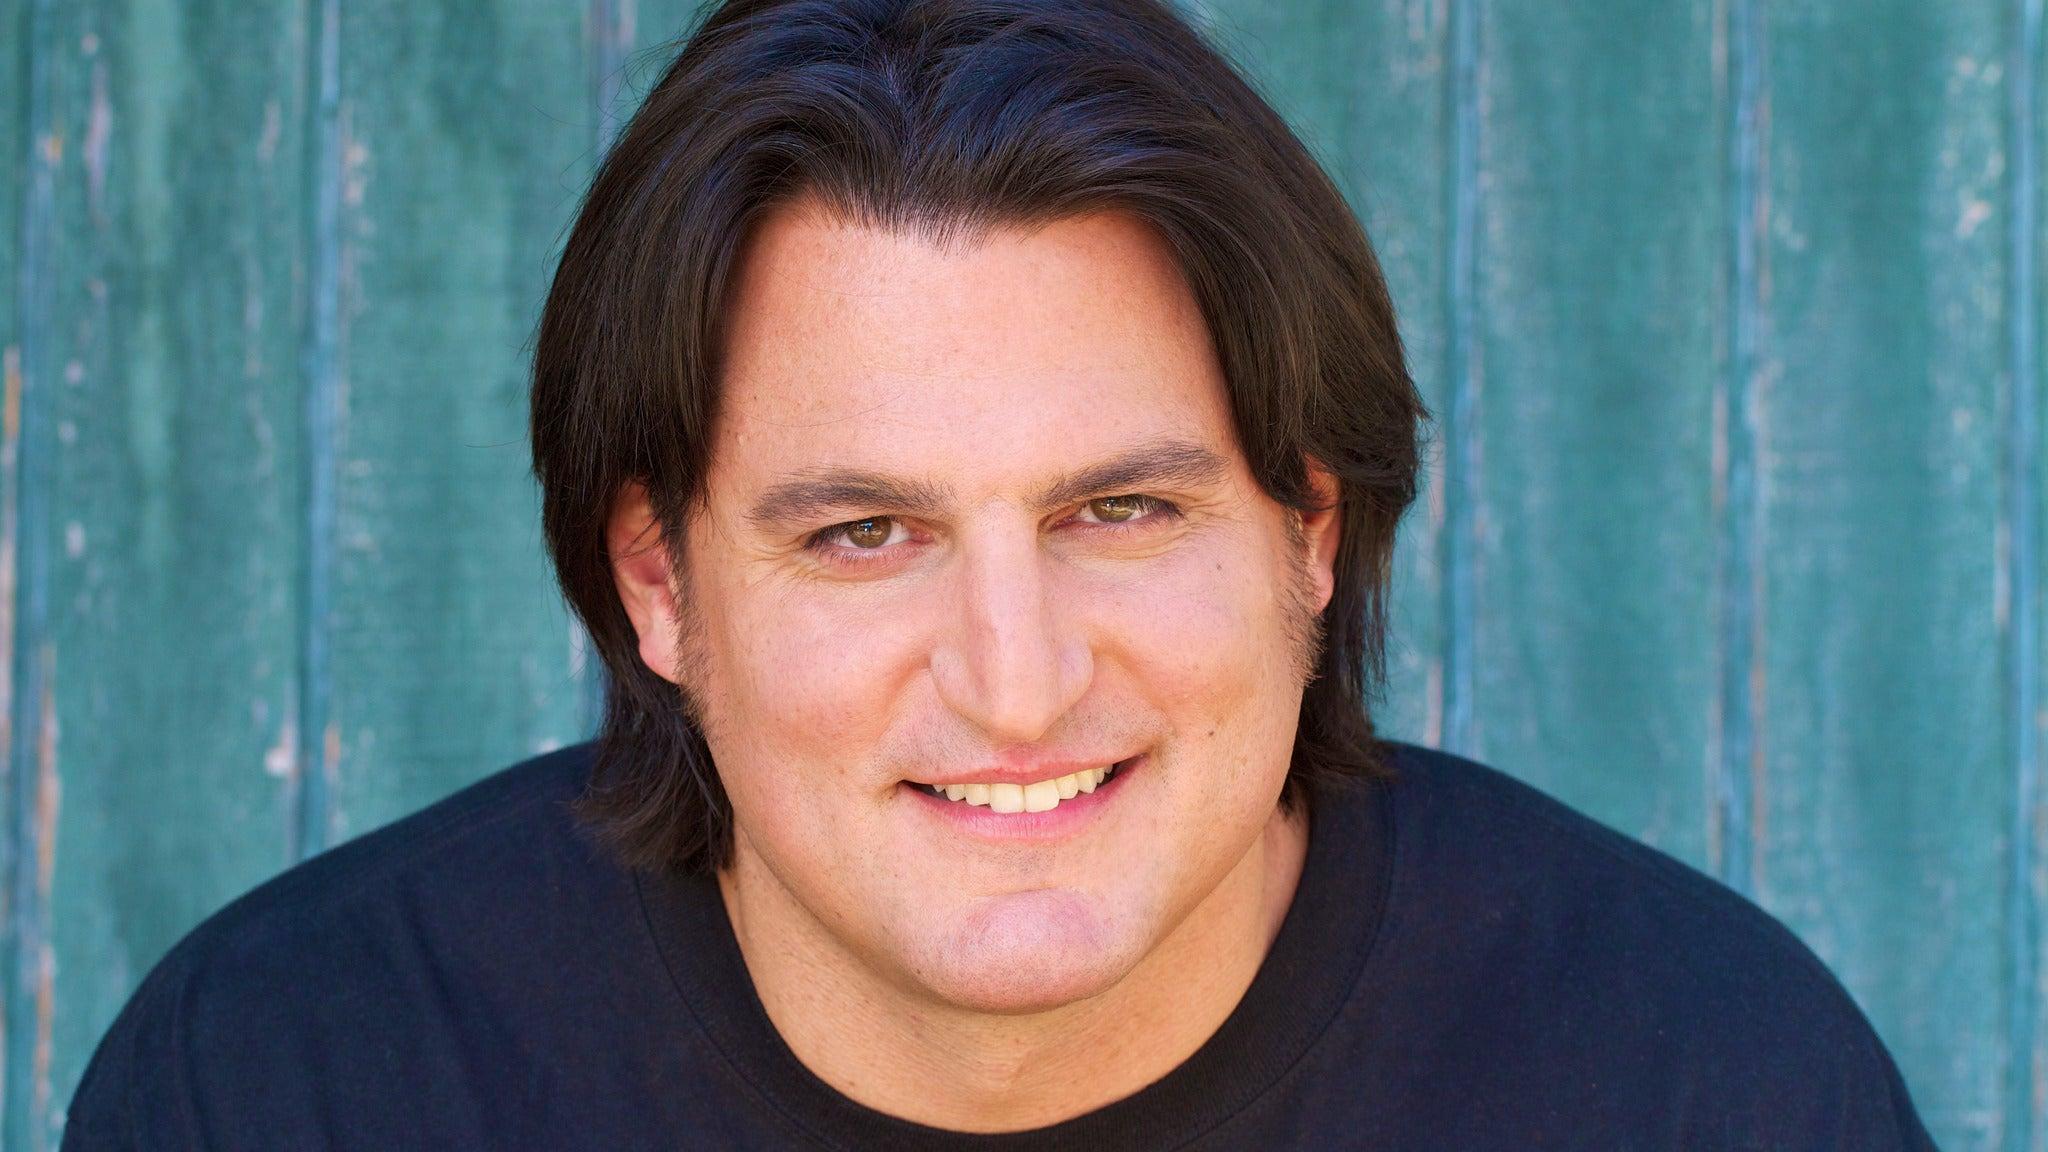 Joe Bartnick at Punch Line Comedy Club - San Francisco